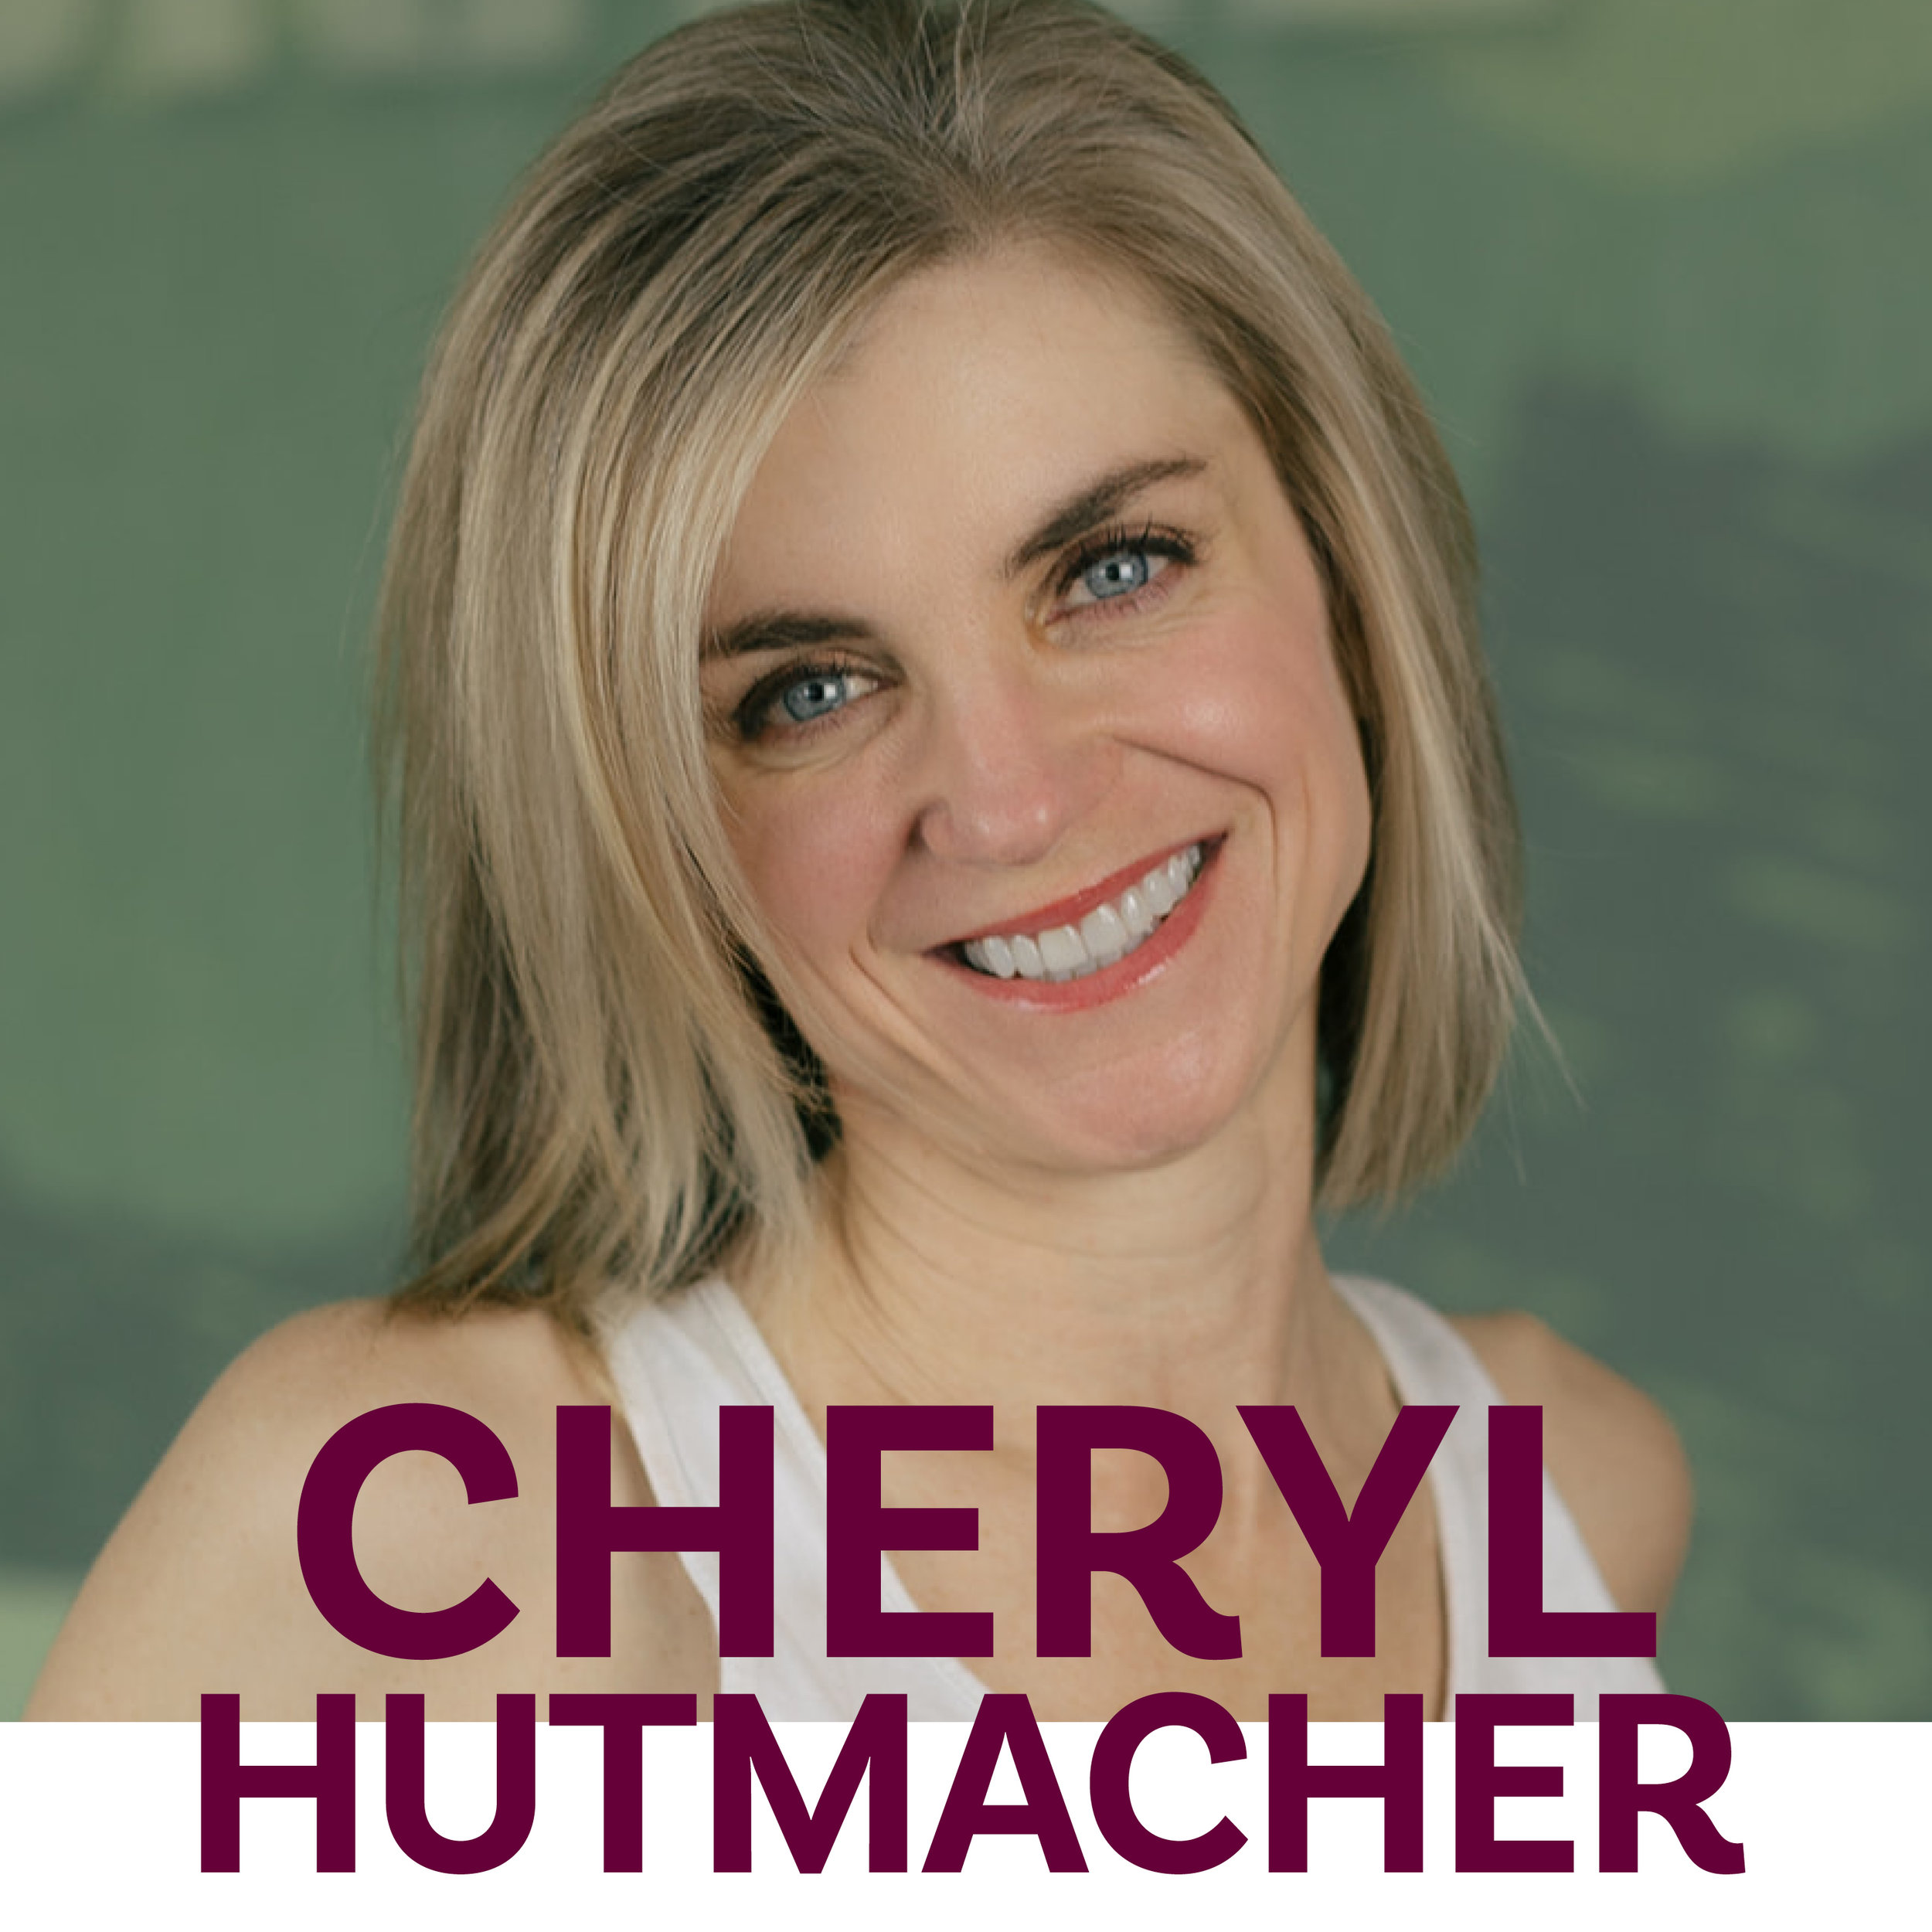 CHERYL HUTMACHER  Bio coming soon!